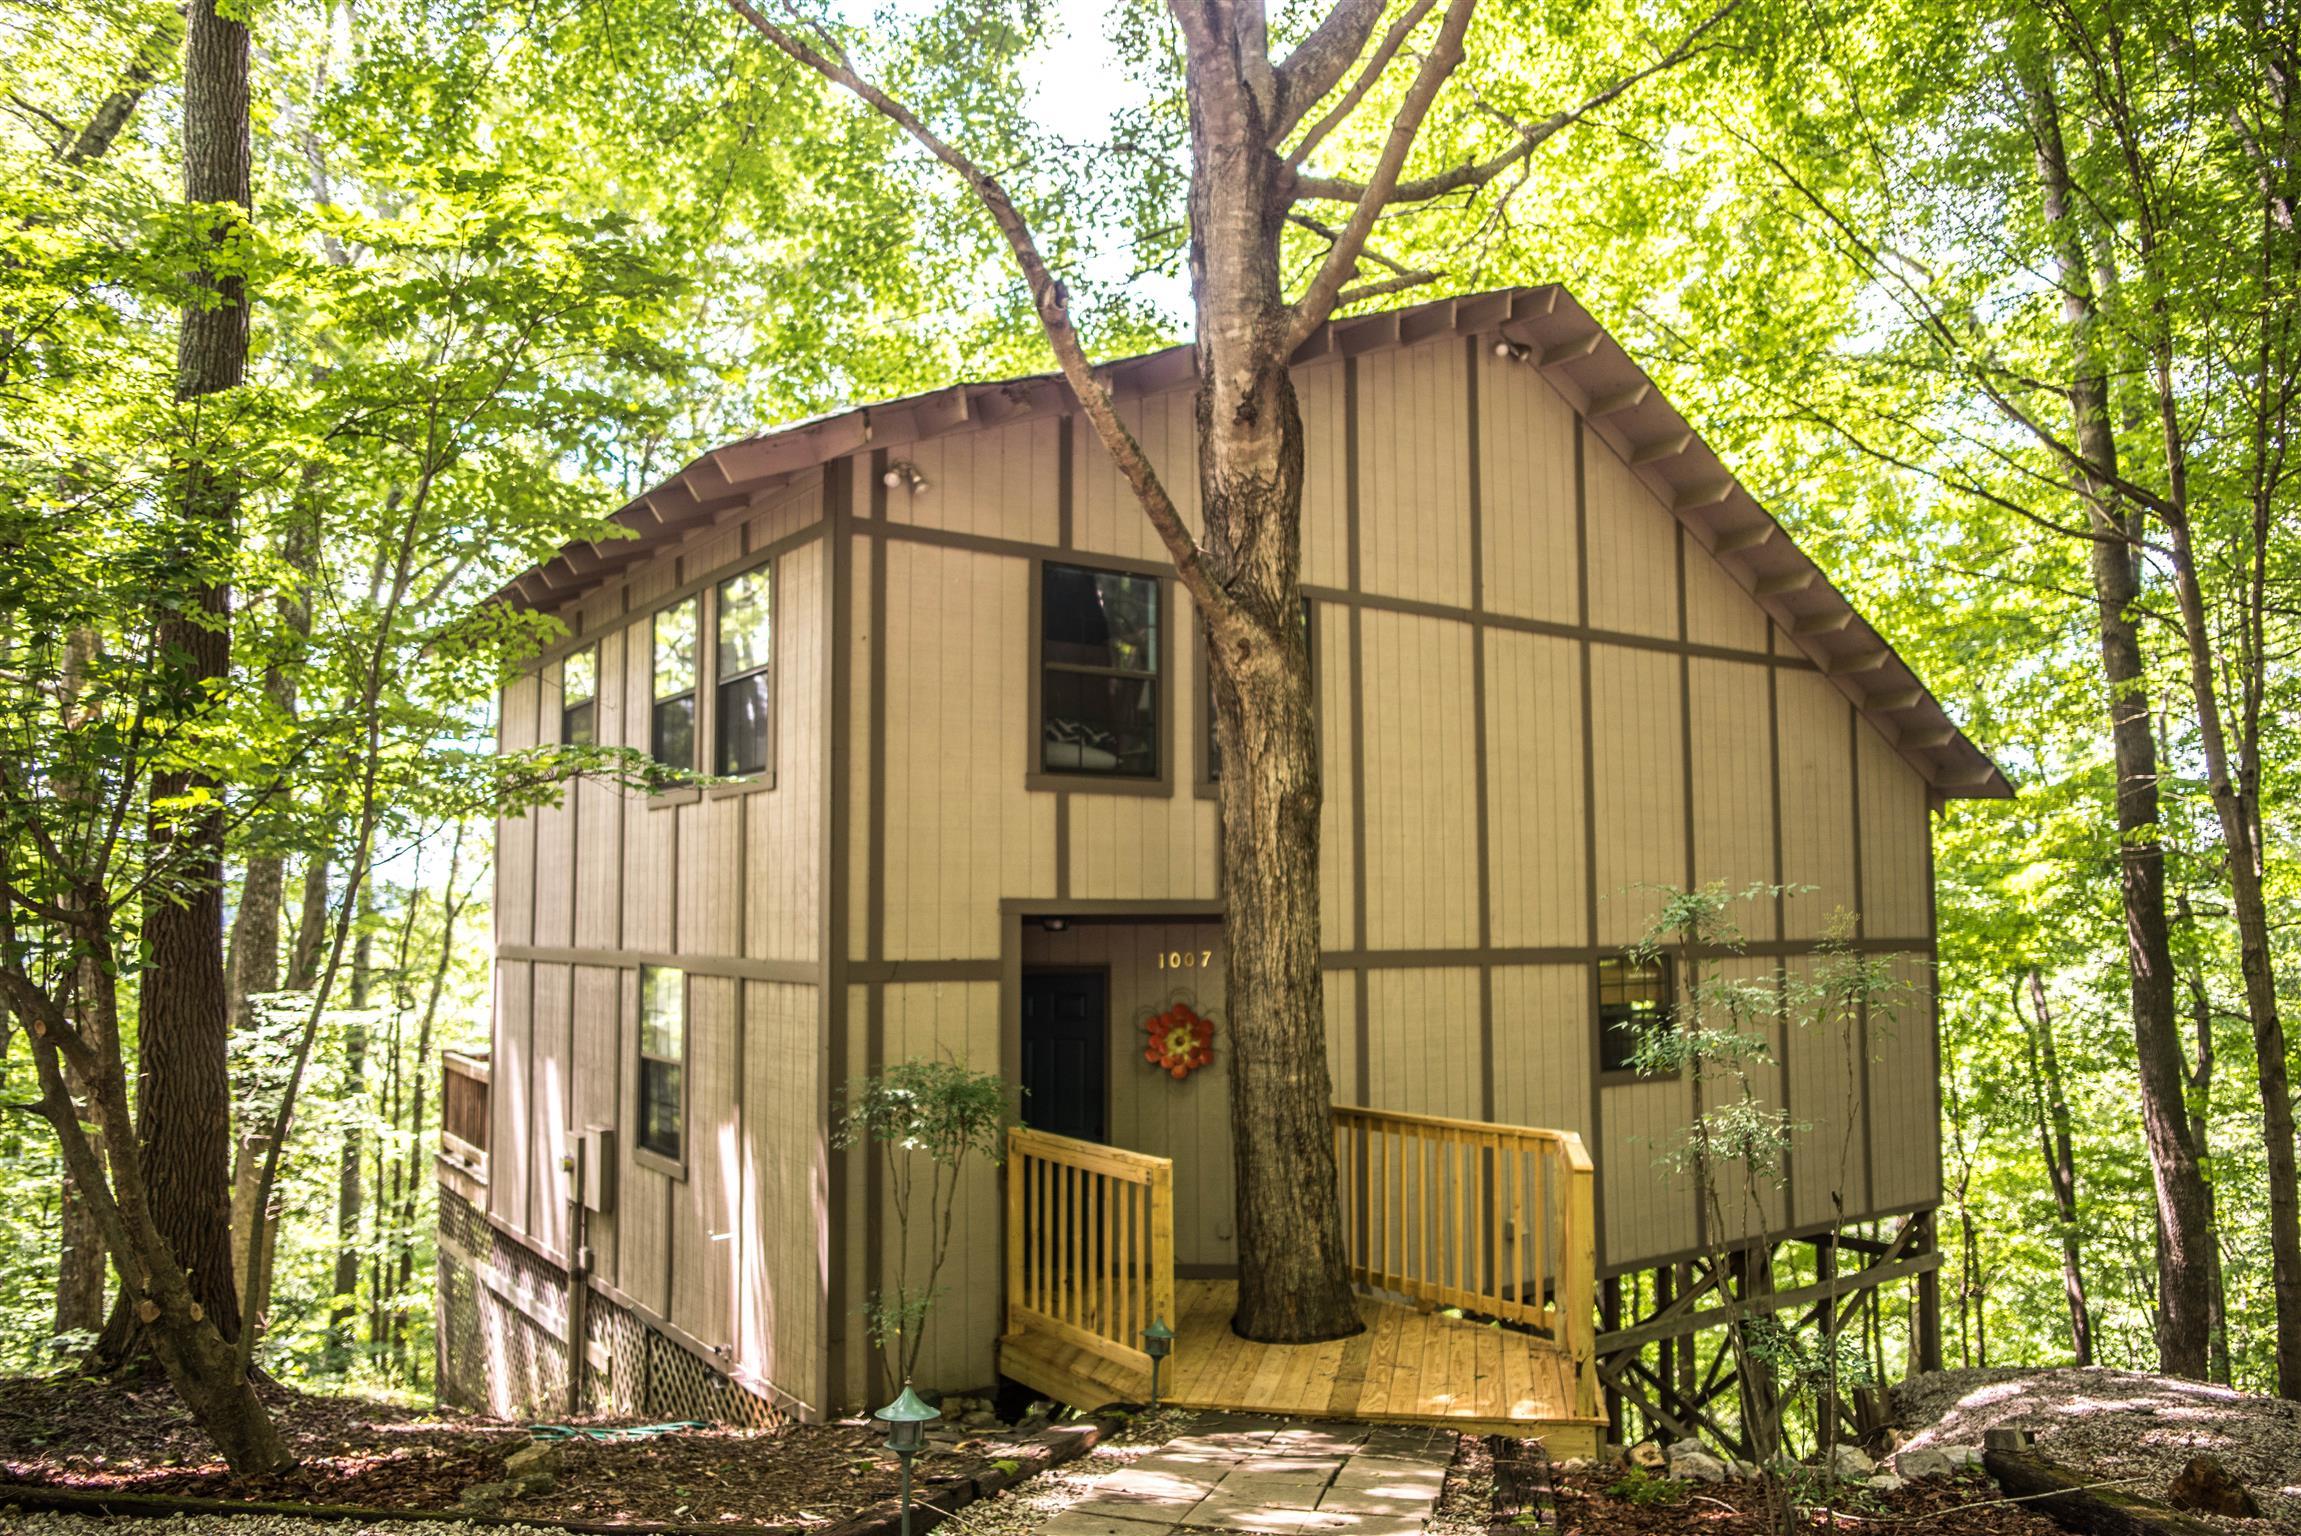 1007 Cove Hollow Rd, Lancaster, TN 38569 - Lancaster, TN real estate listing